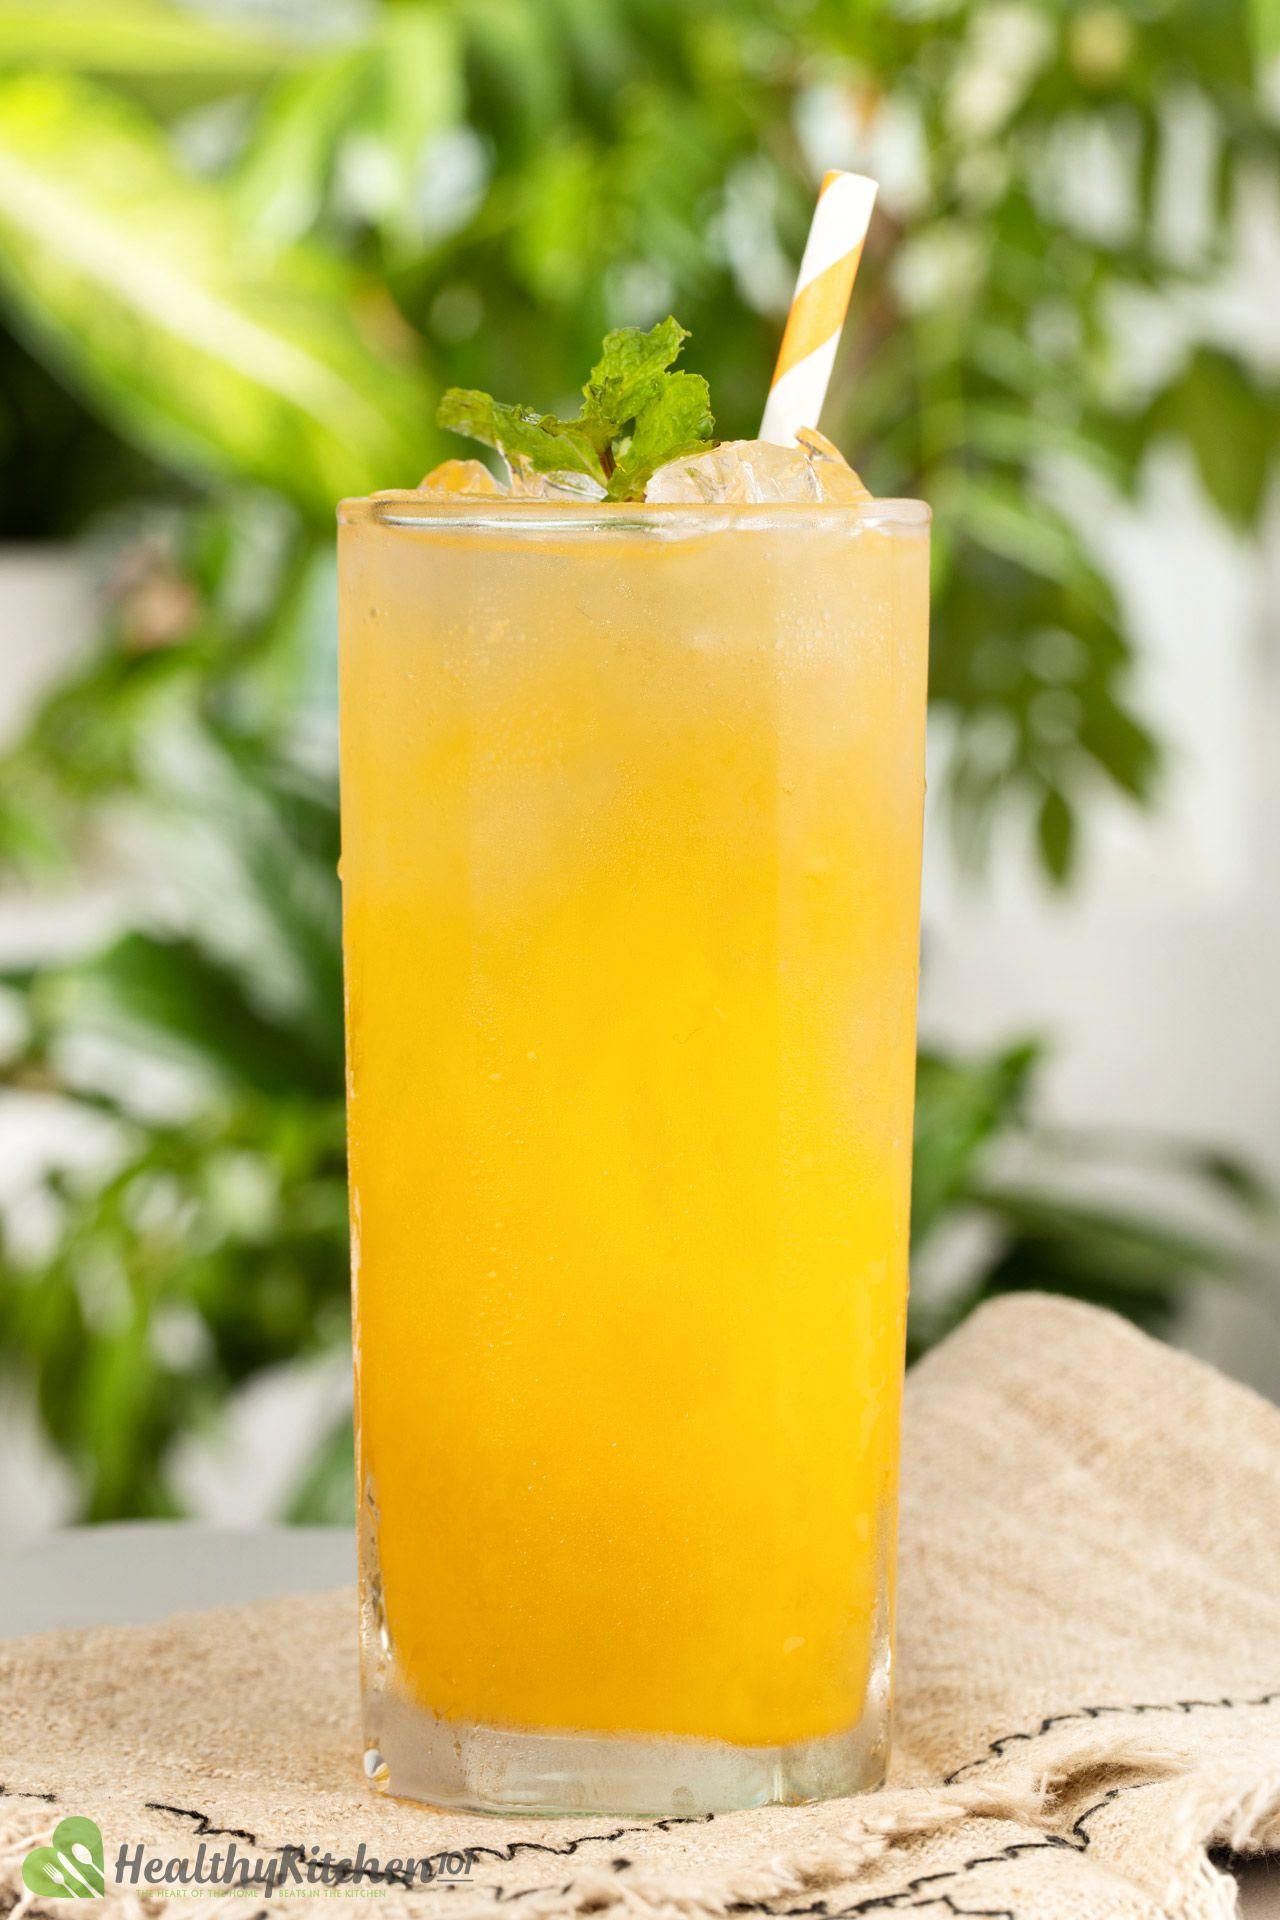 Ginger Ale and Orange Juice Recipe